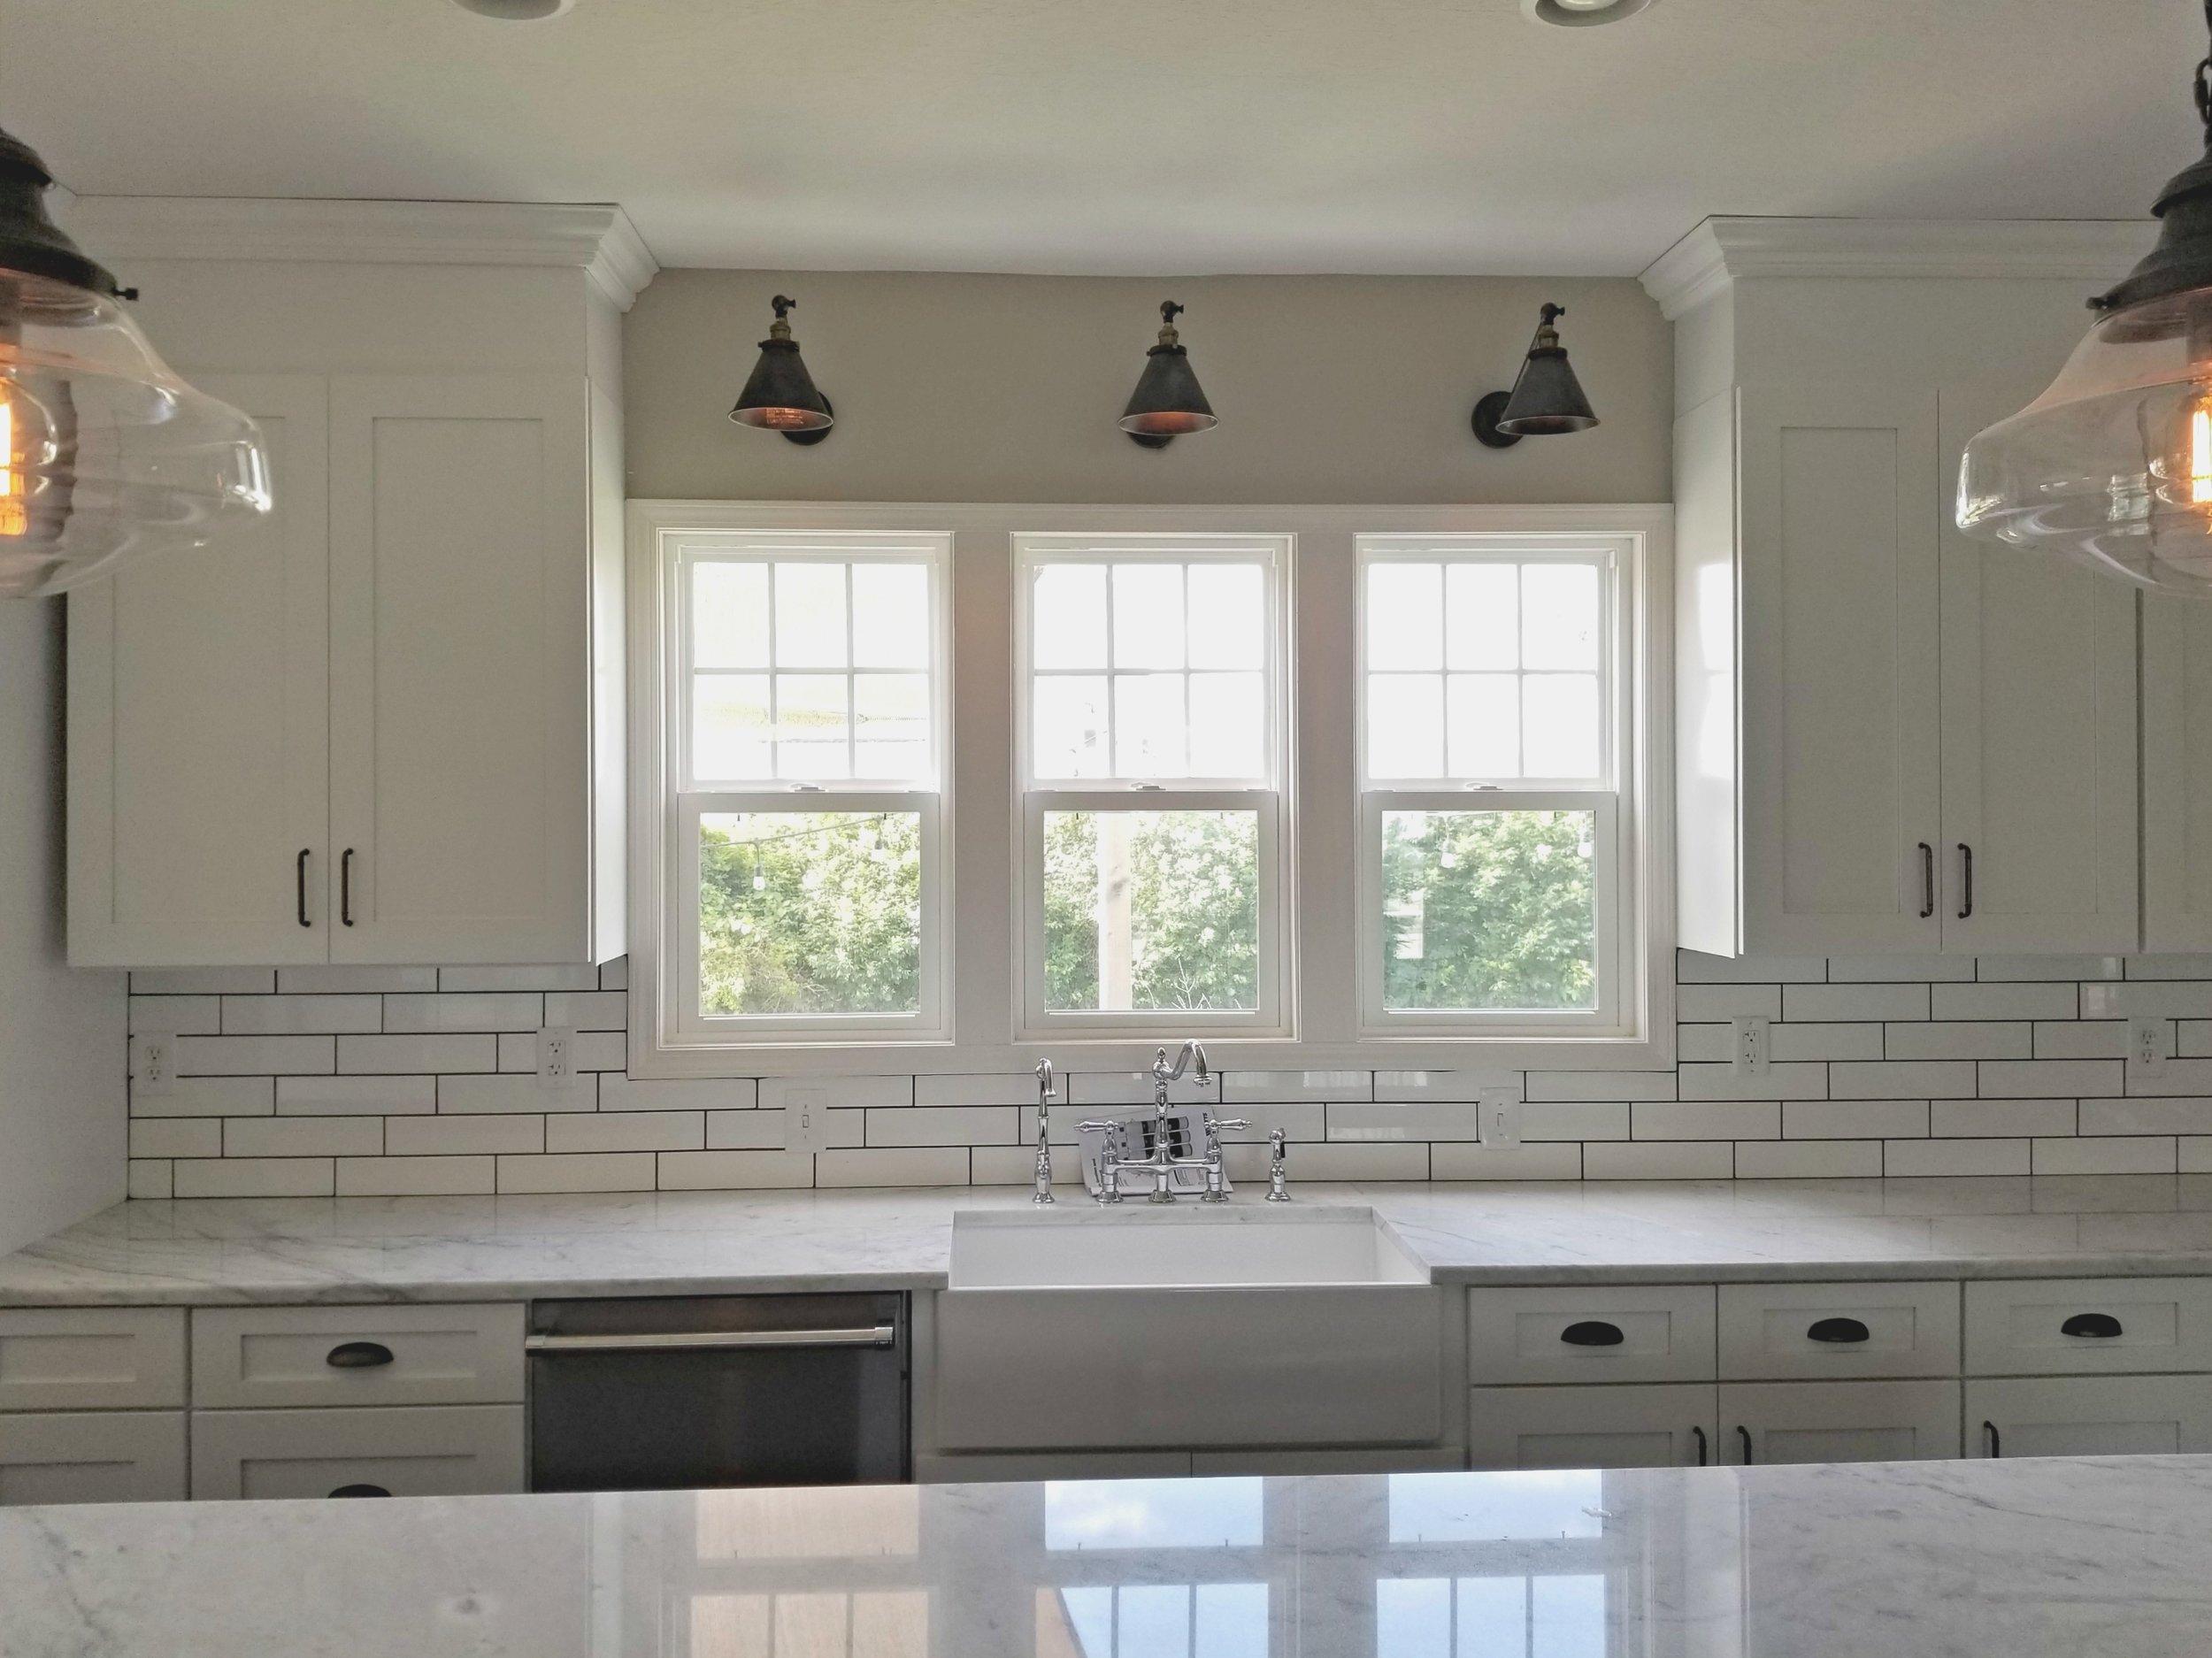 - Subway tile backsplashFarm-style sinkCustom cabinetsNew windows cut into wall for natural light